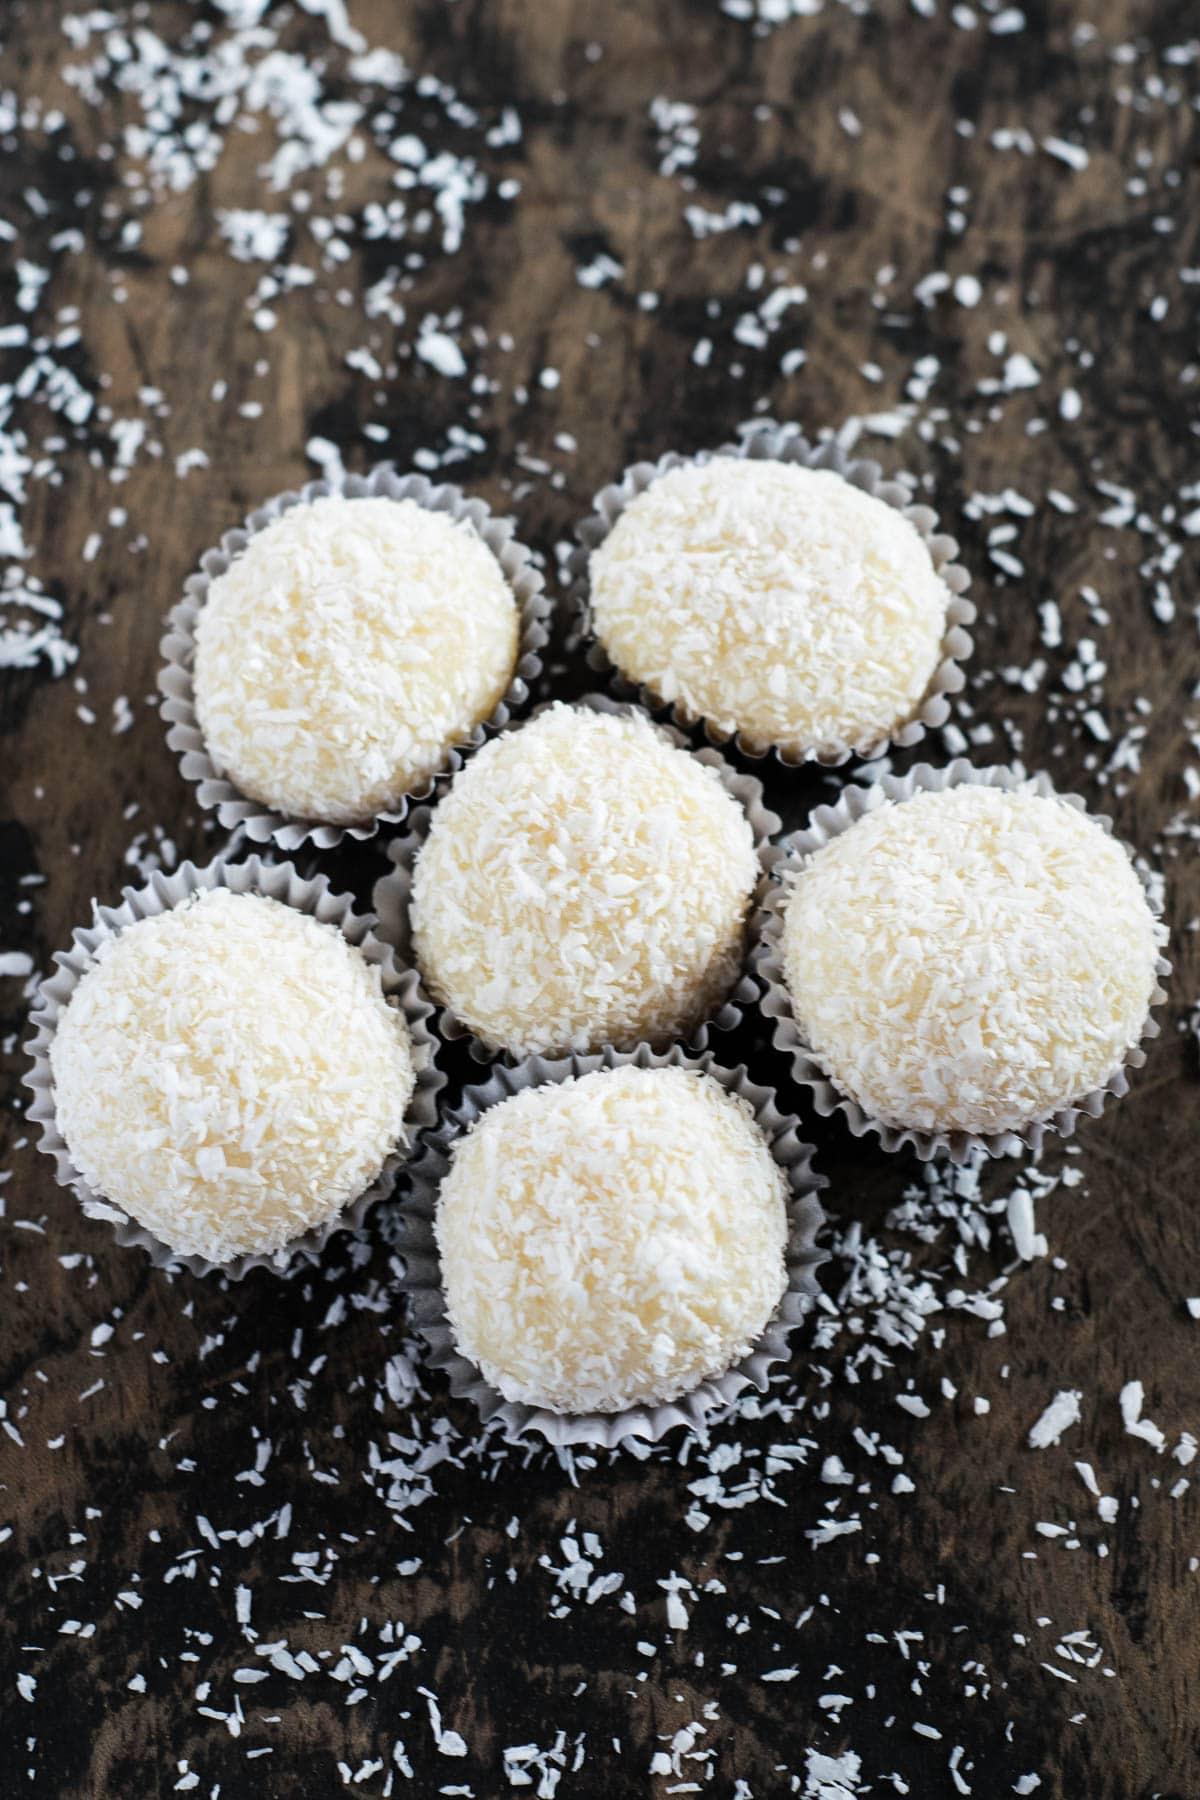 Beijinhos: Brazilian Coconut Truffles